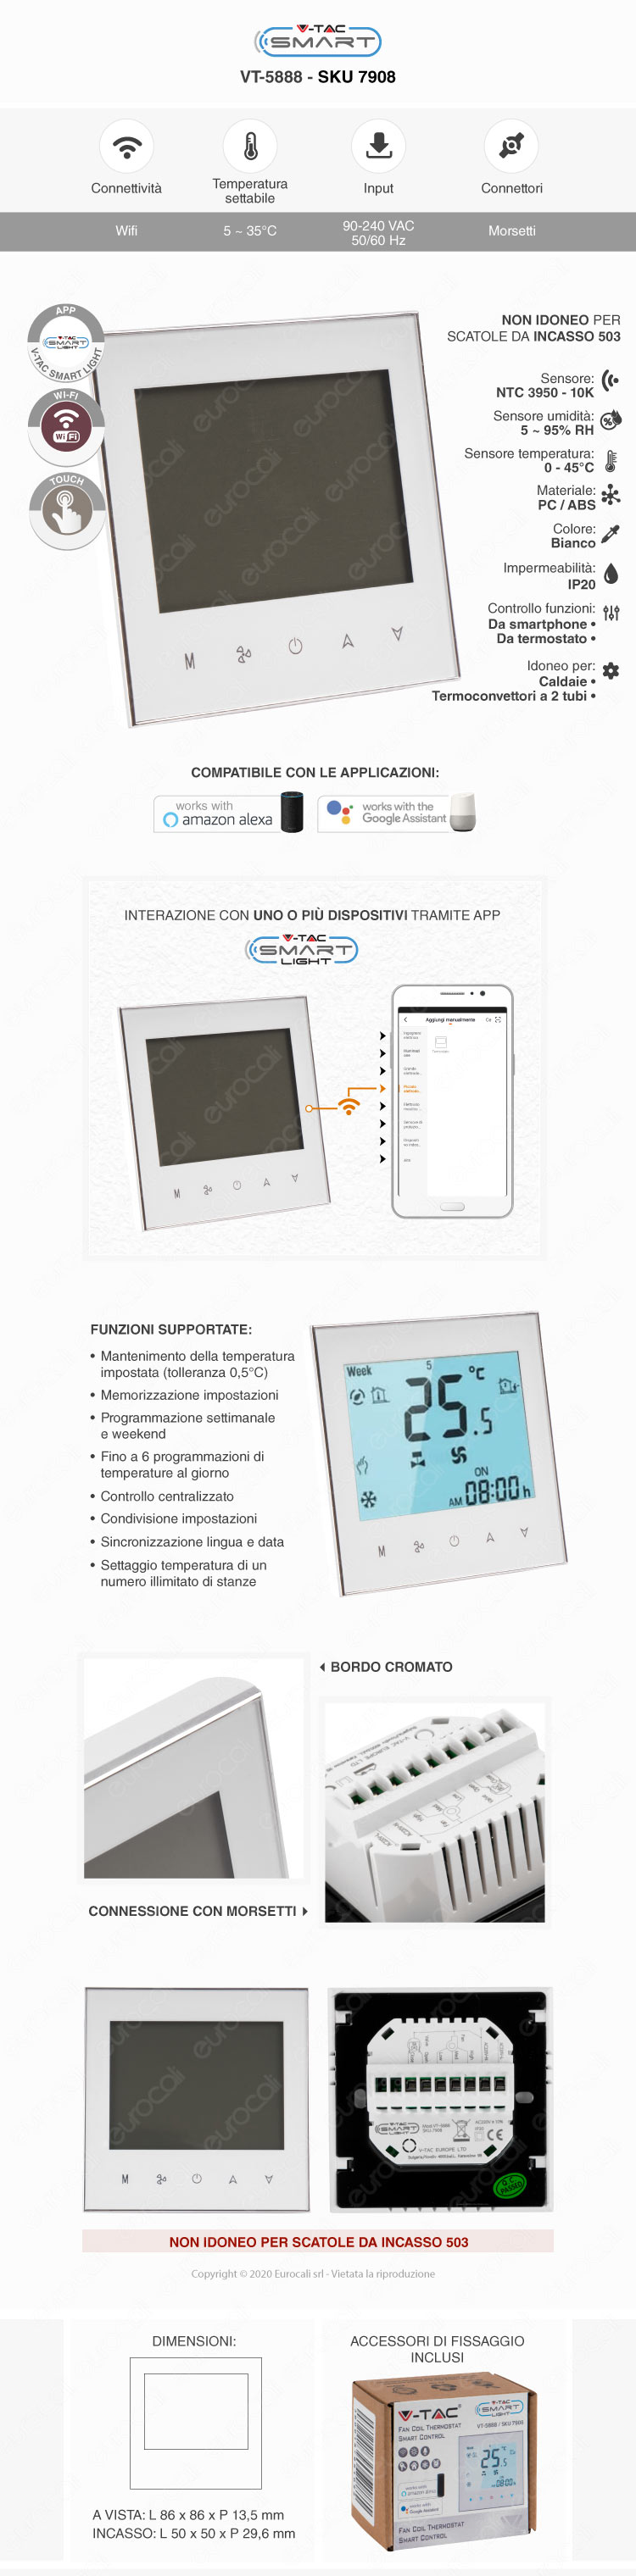 V-Tac VT-5888 Termostato Wi-Fi